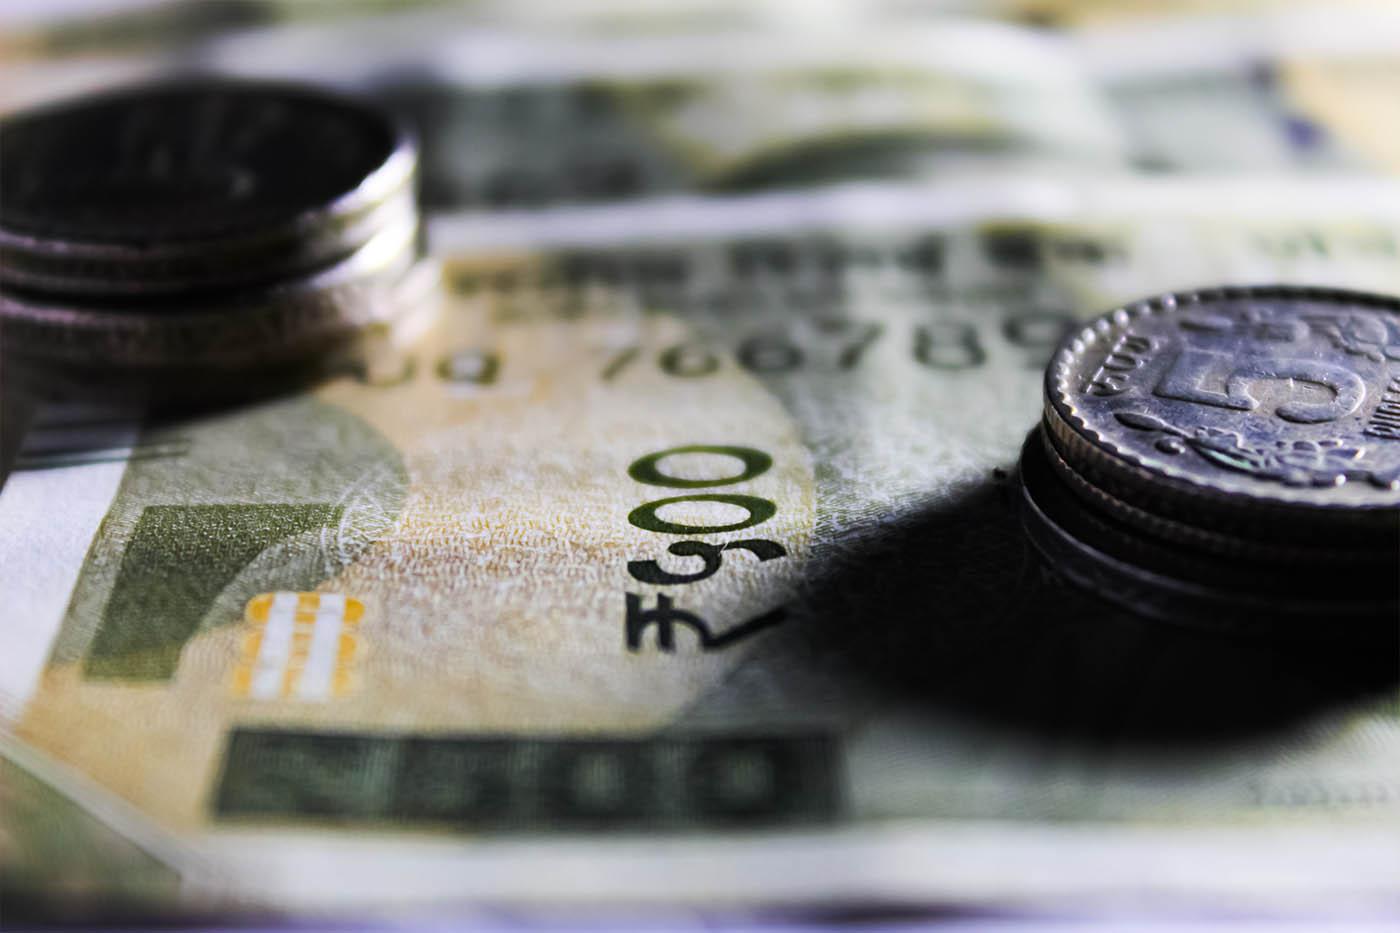 Plum receives Rs 110 crore in Series B Funding round